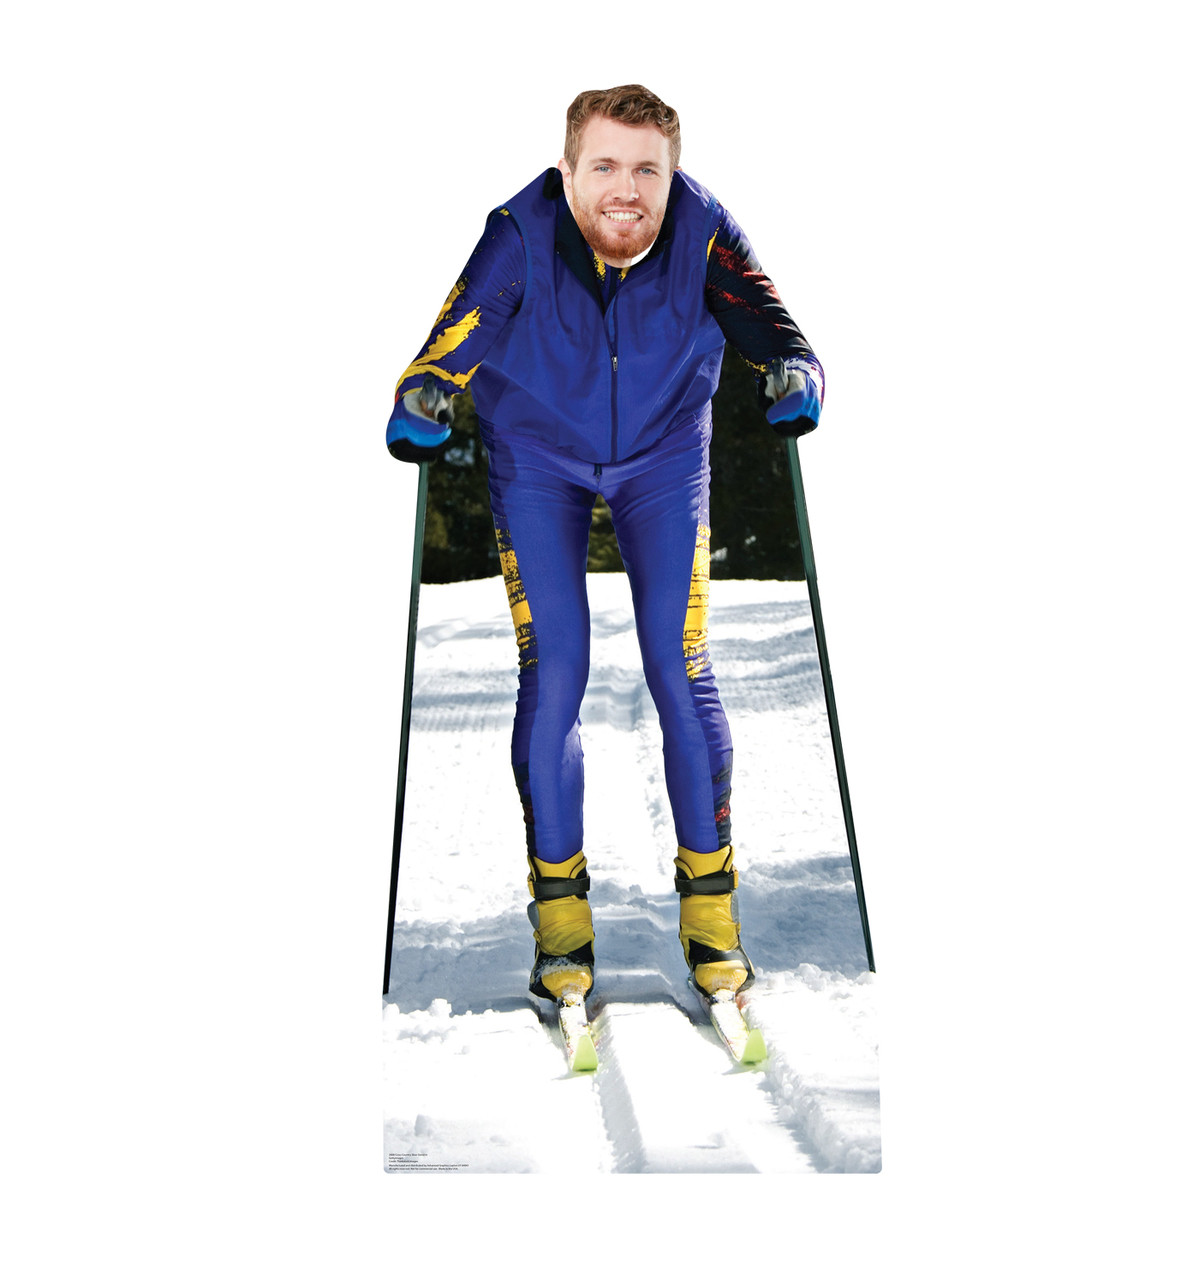 Cross Country Ski Standin Cardboard Cutout